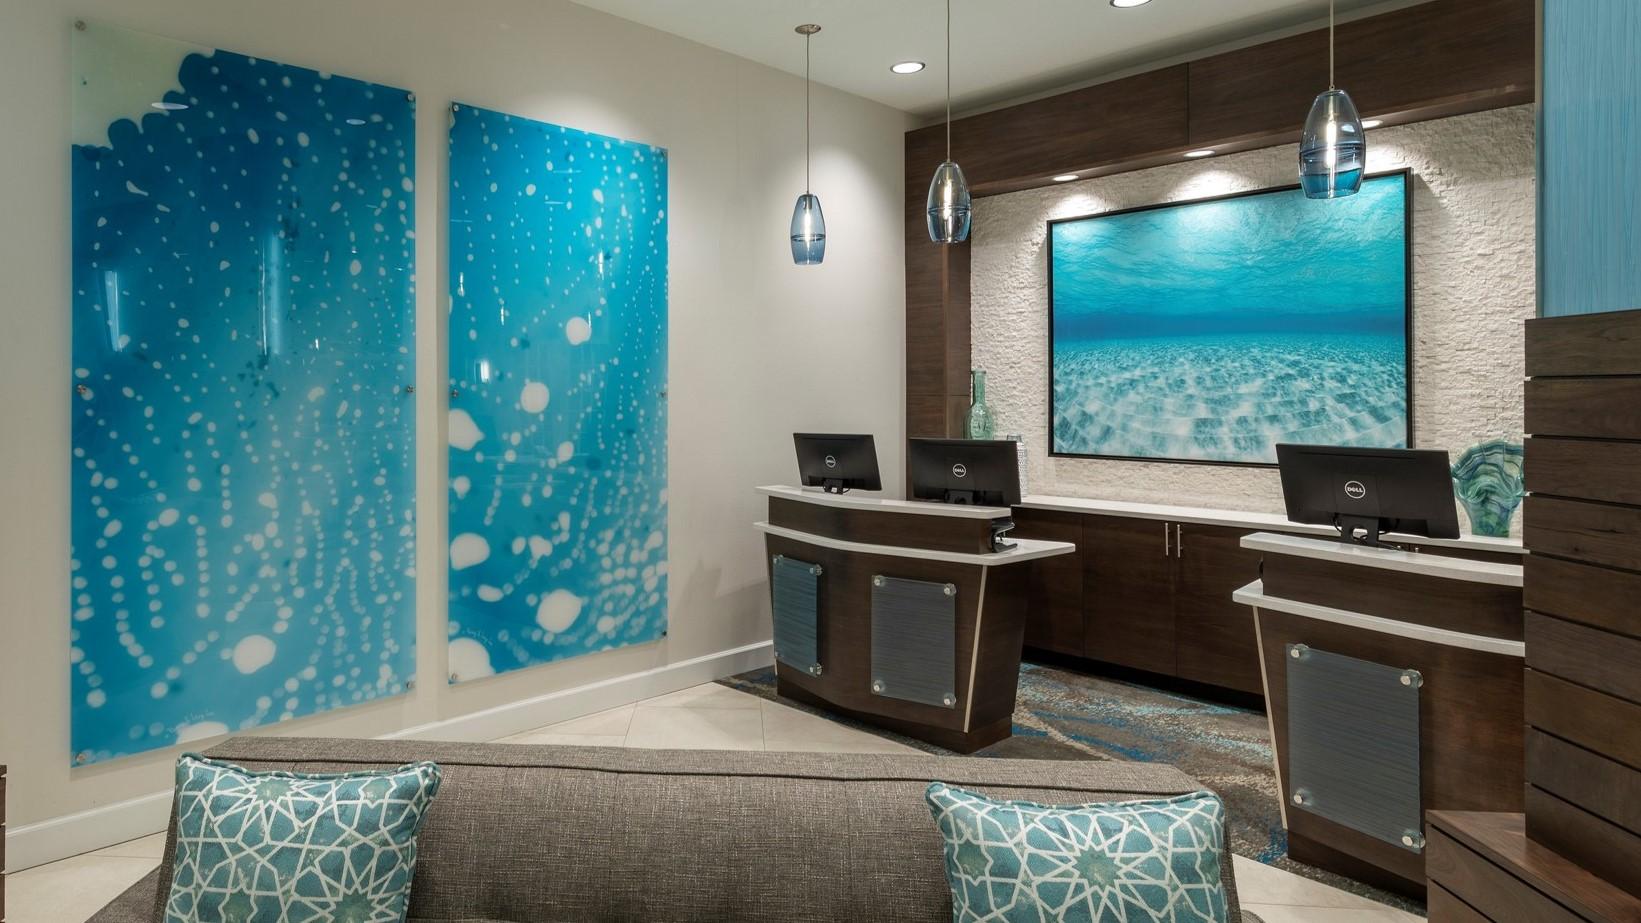 Sena Hospitality Design Projects for Exploria Resorts Up for American Resort Development Association Awards